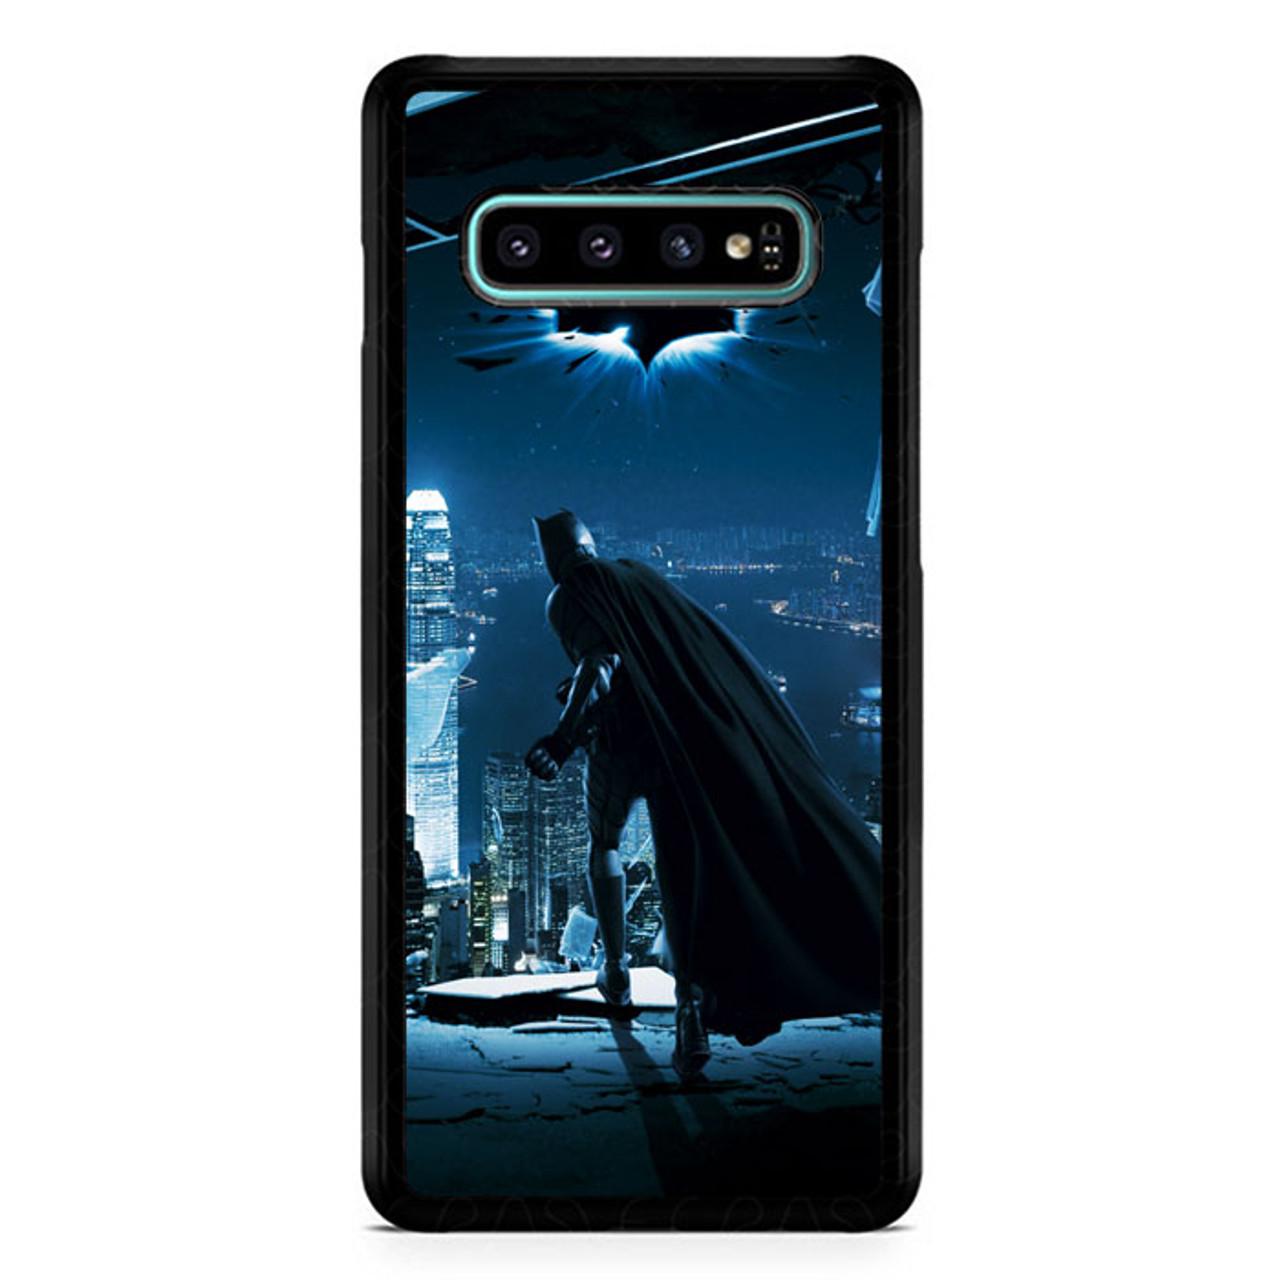 Samsung S10 Plus Batman Wallpaper